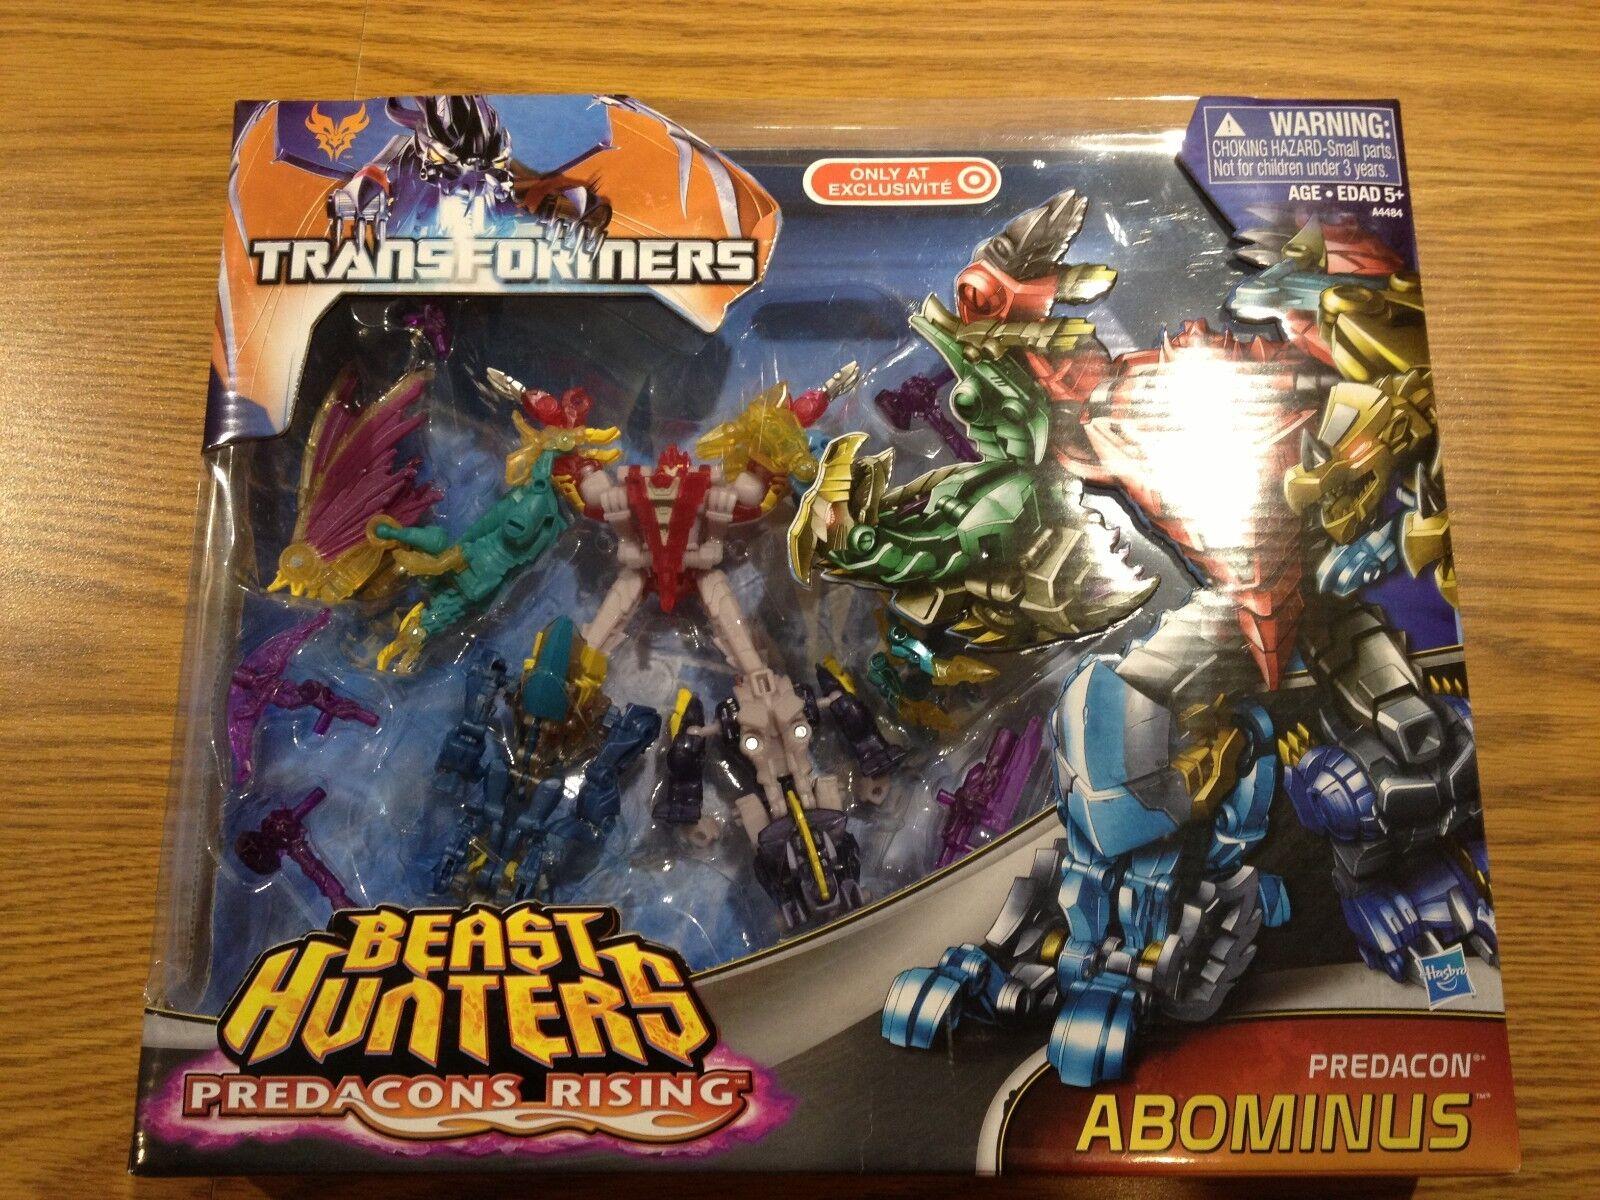 Transformers ABOMINUS Predacons Rising (Target Beast Hunters, Hasbro)  NEW